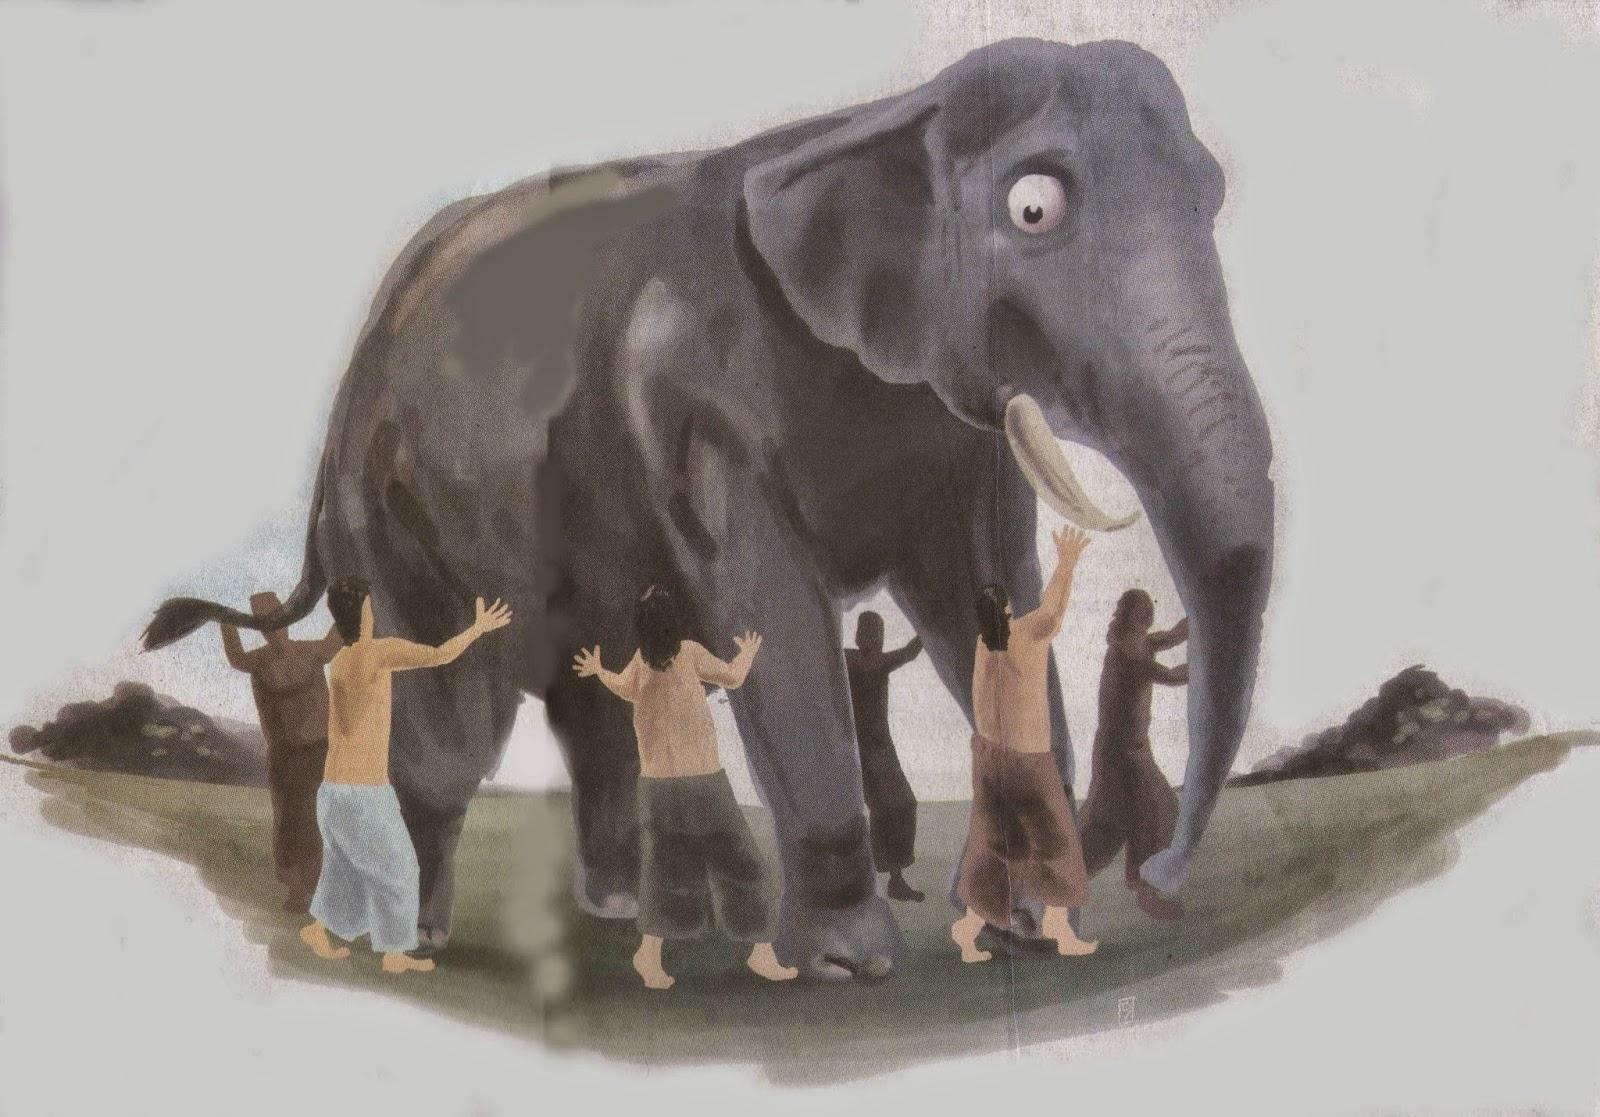 blind-men-and-an-elephant.jpg